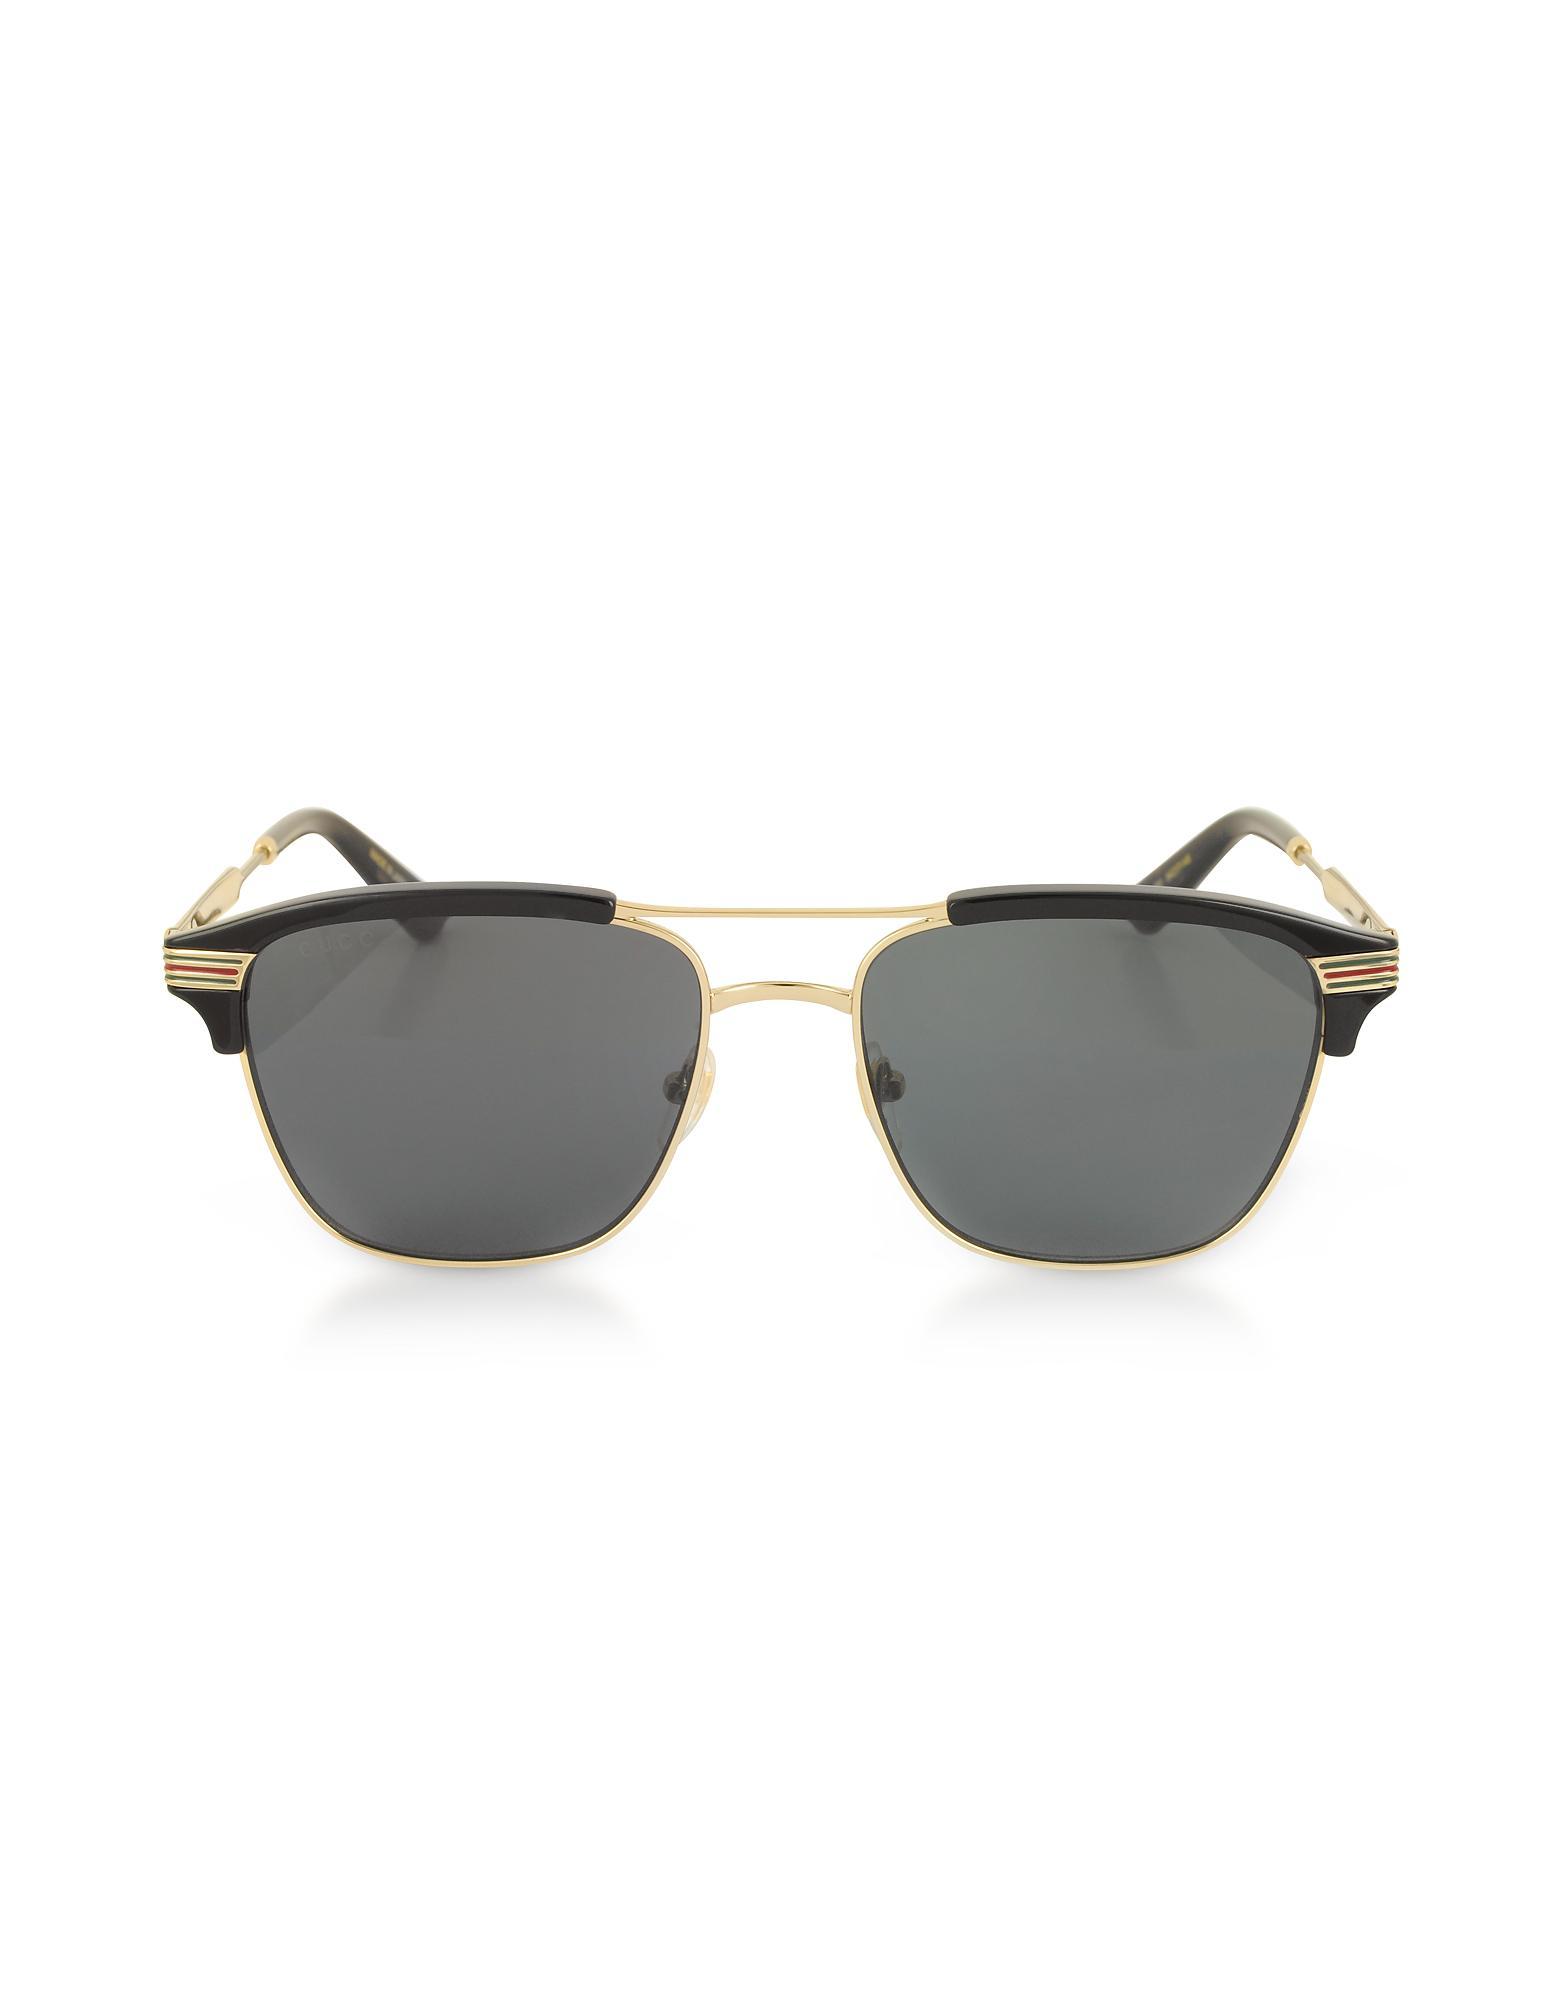 fff29e2a05 Lyst - Gucci Gg0241s 002 Square-frame Metal Sunglasses in Black